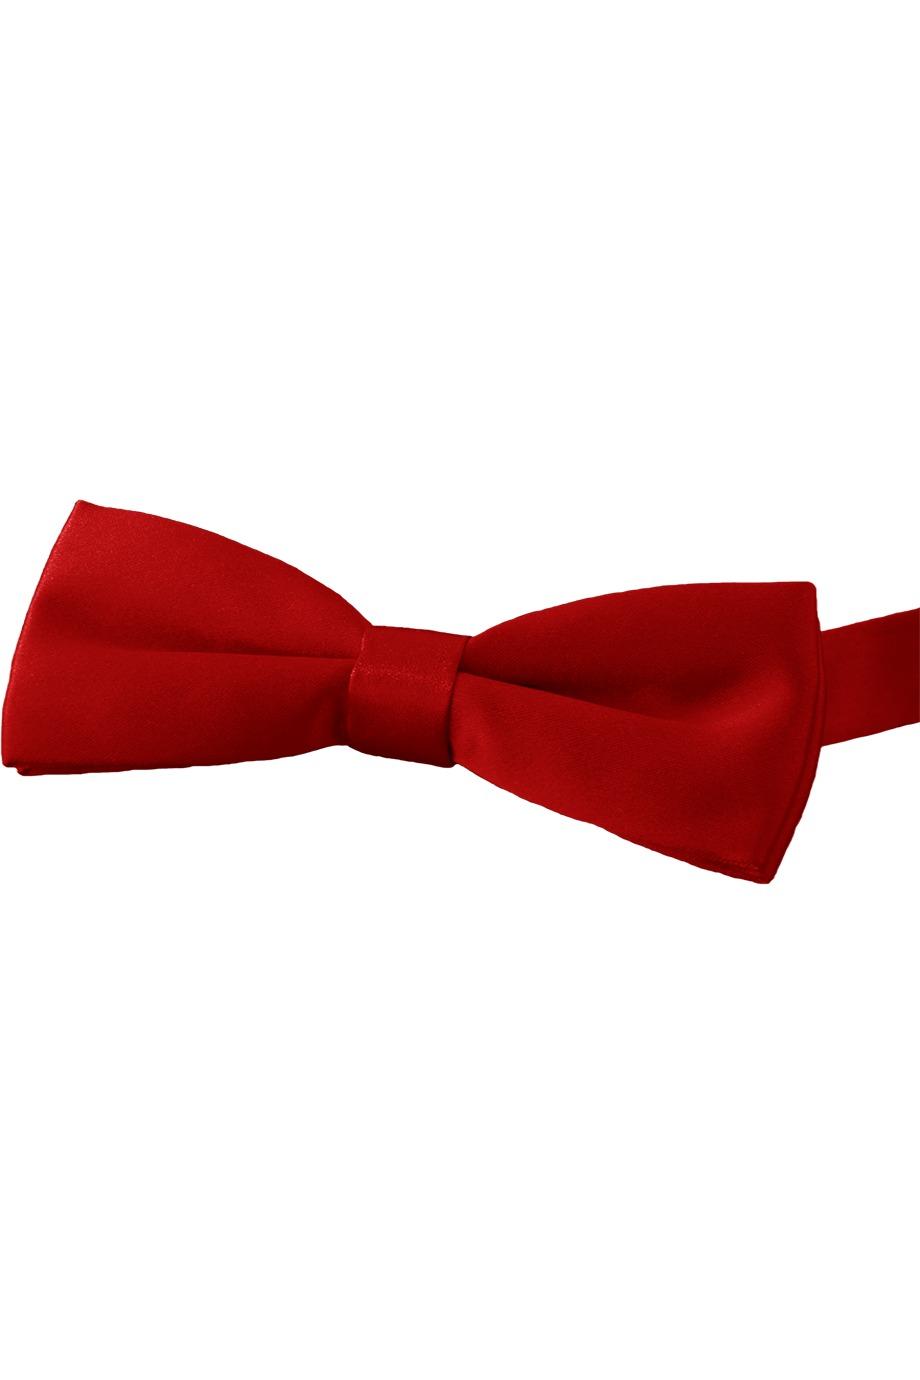 Edwards Garment TT00 - Satin Bow Tie